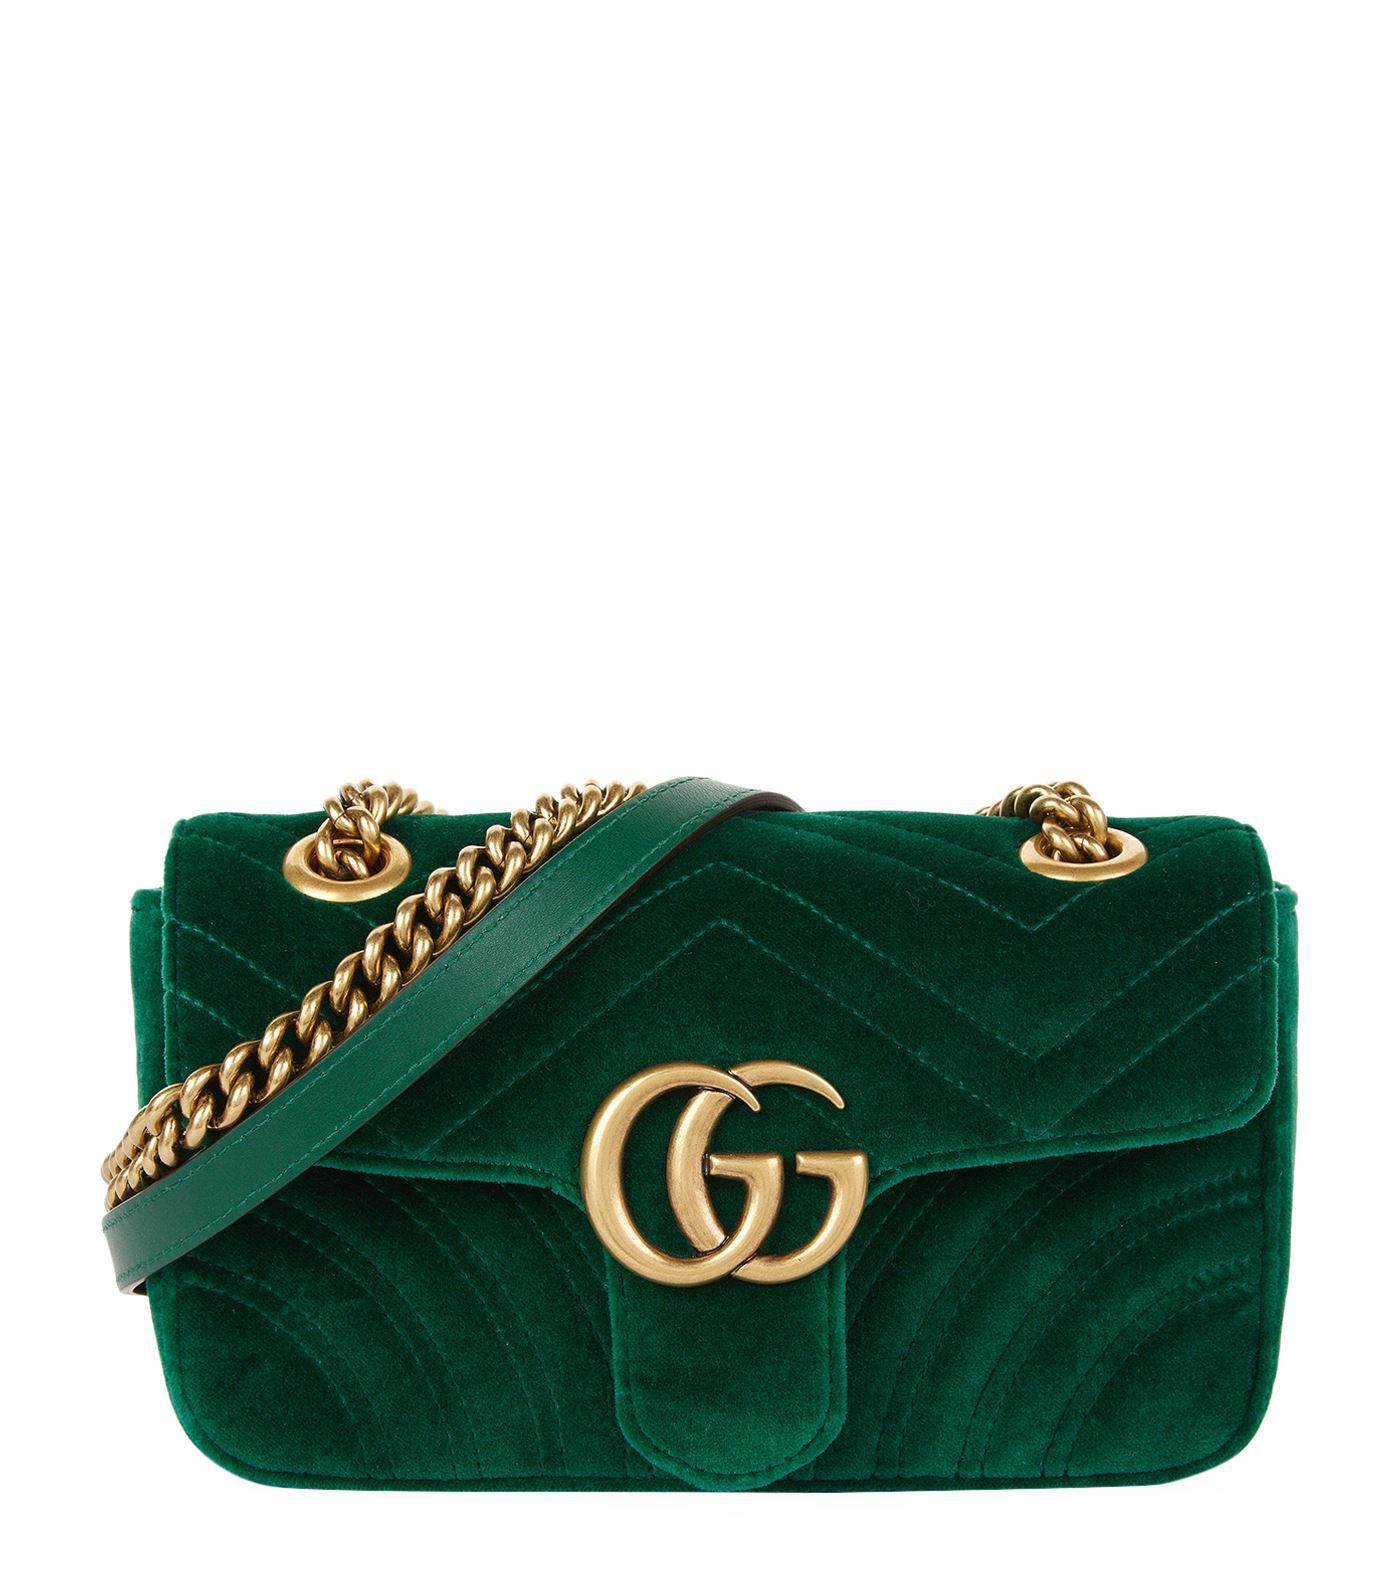 b9ebb29dc1b Gucci Mini Velvet Marmont Shoulder Bag in Green - Save 5% - Lyst